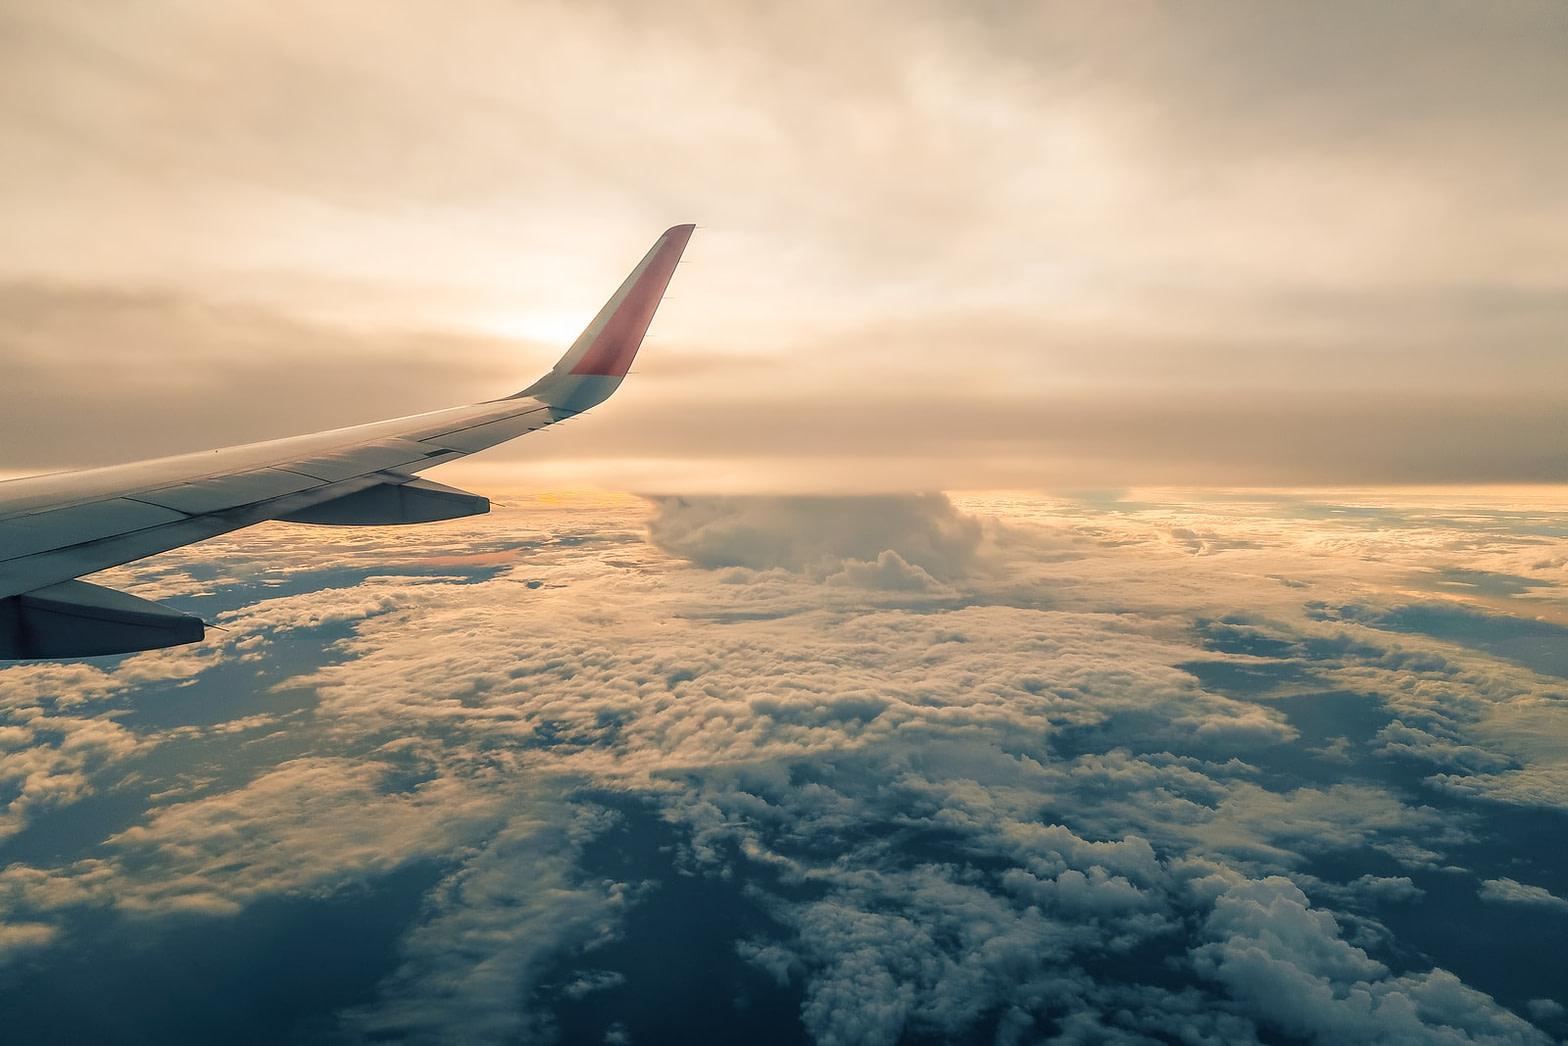 رحلات طيران جنيف جدة gva jed